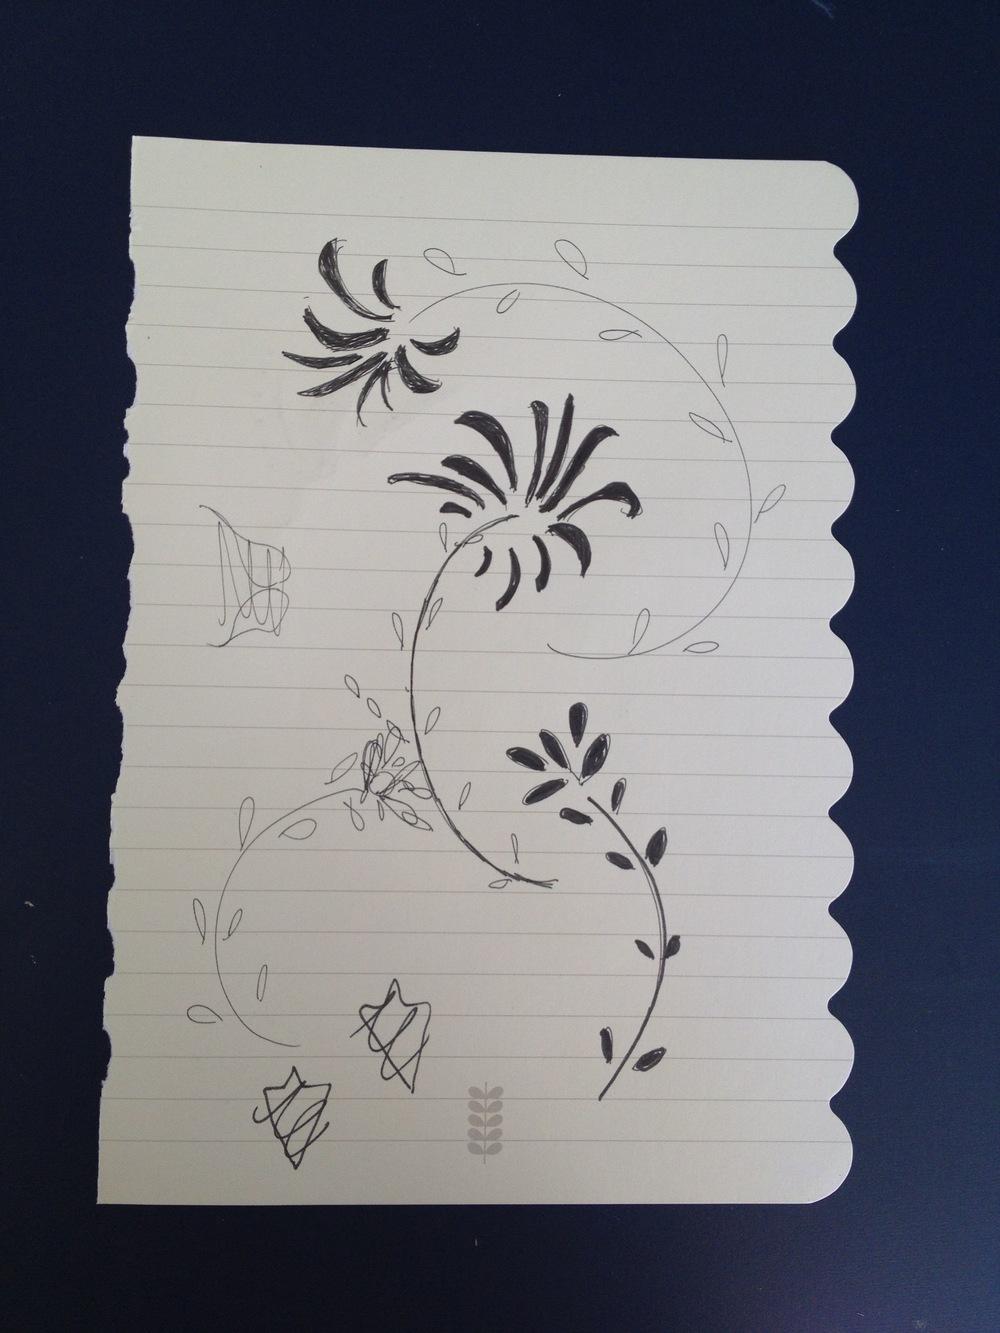 stencil_sketch.jpg